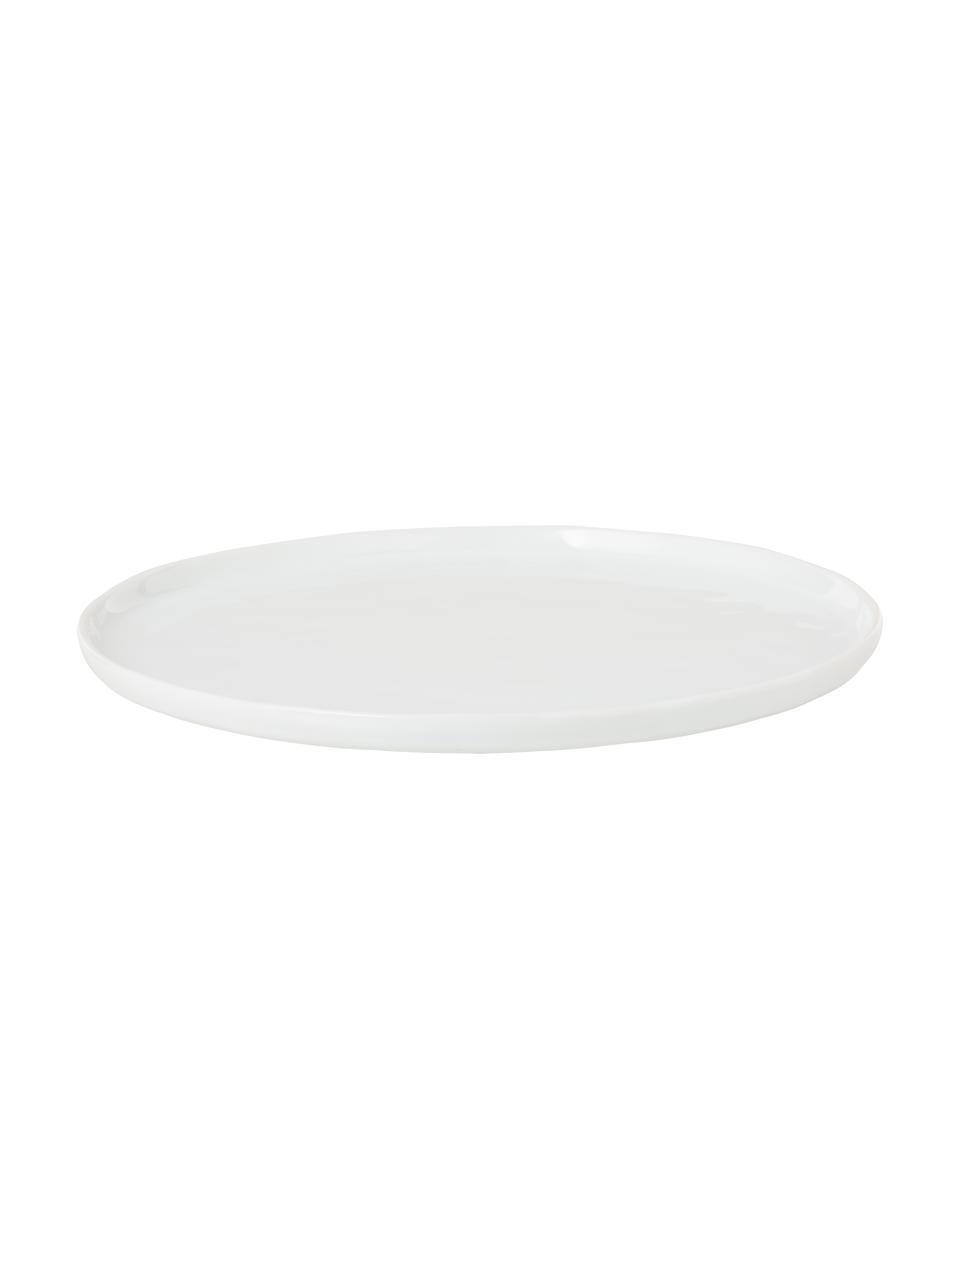 Piatto piano con superficie irregolare Porcelino 4 pz, Porcellana, volutamente irregolare, Bianco, Ø 27 cm